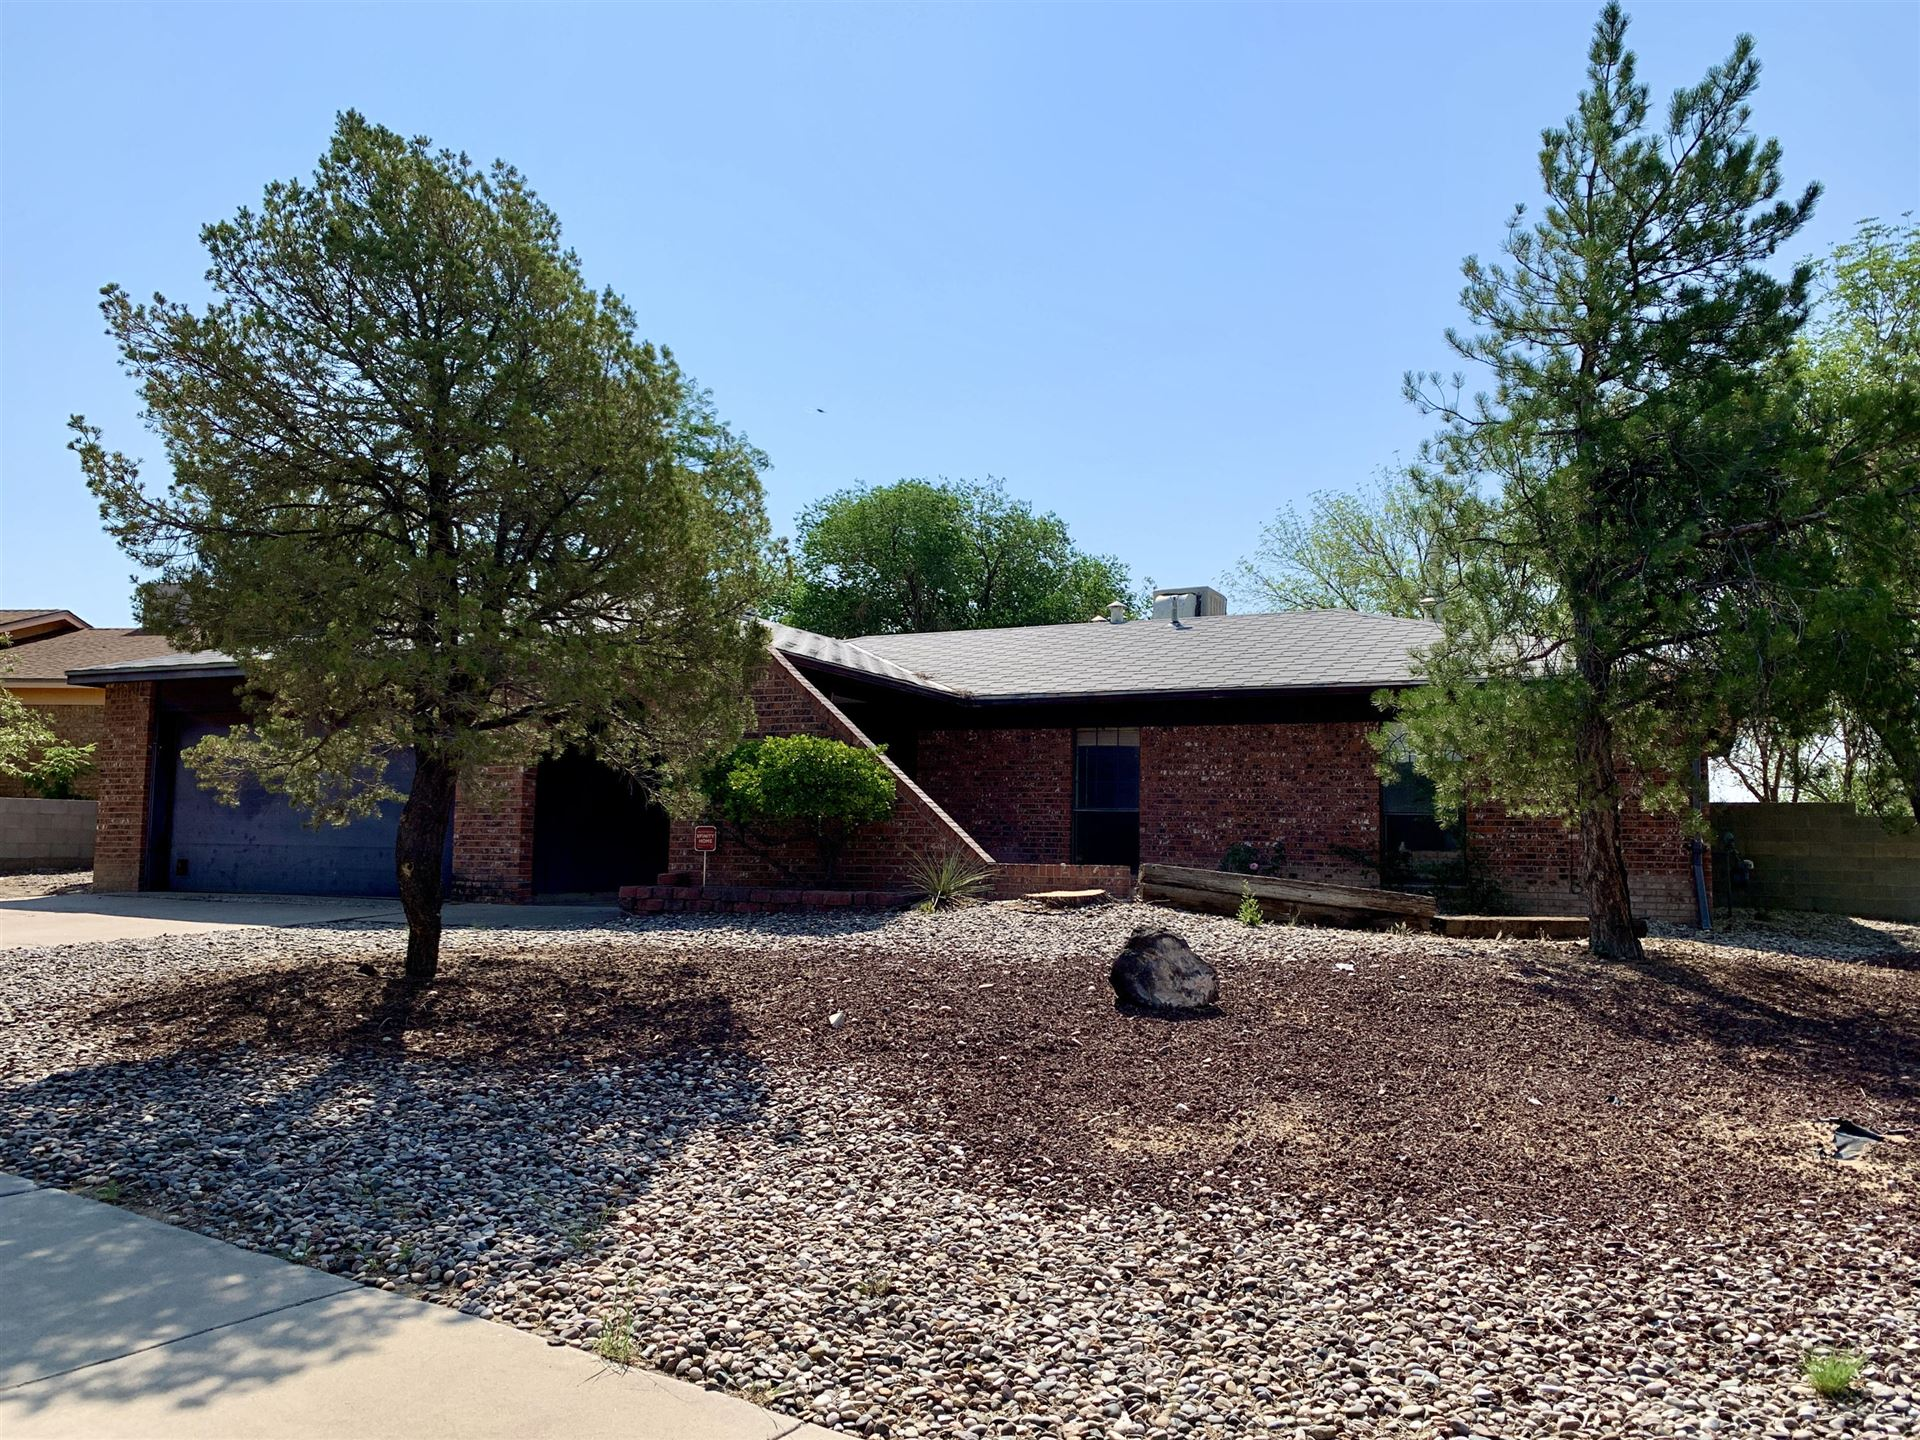 Photo of 7200 MOJAVE Street NW, Albuquerque, NM 87120 (MLS # 994813)